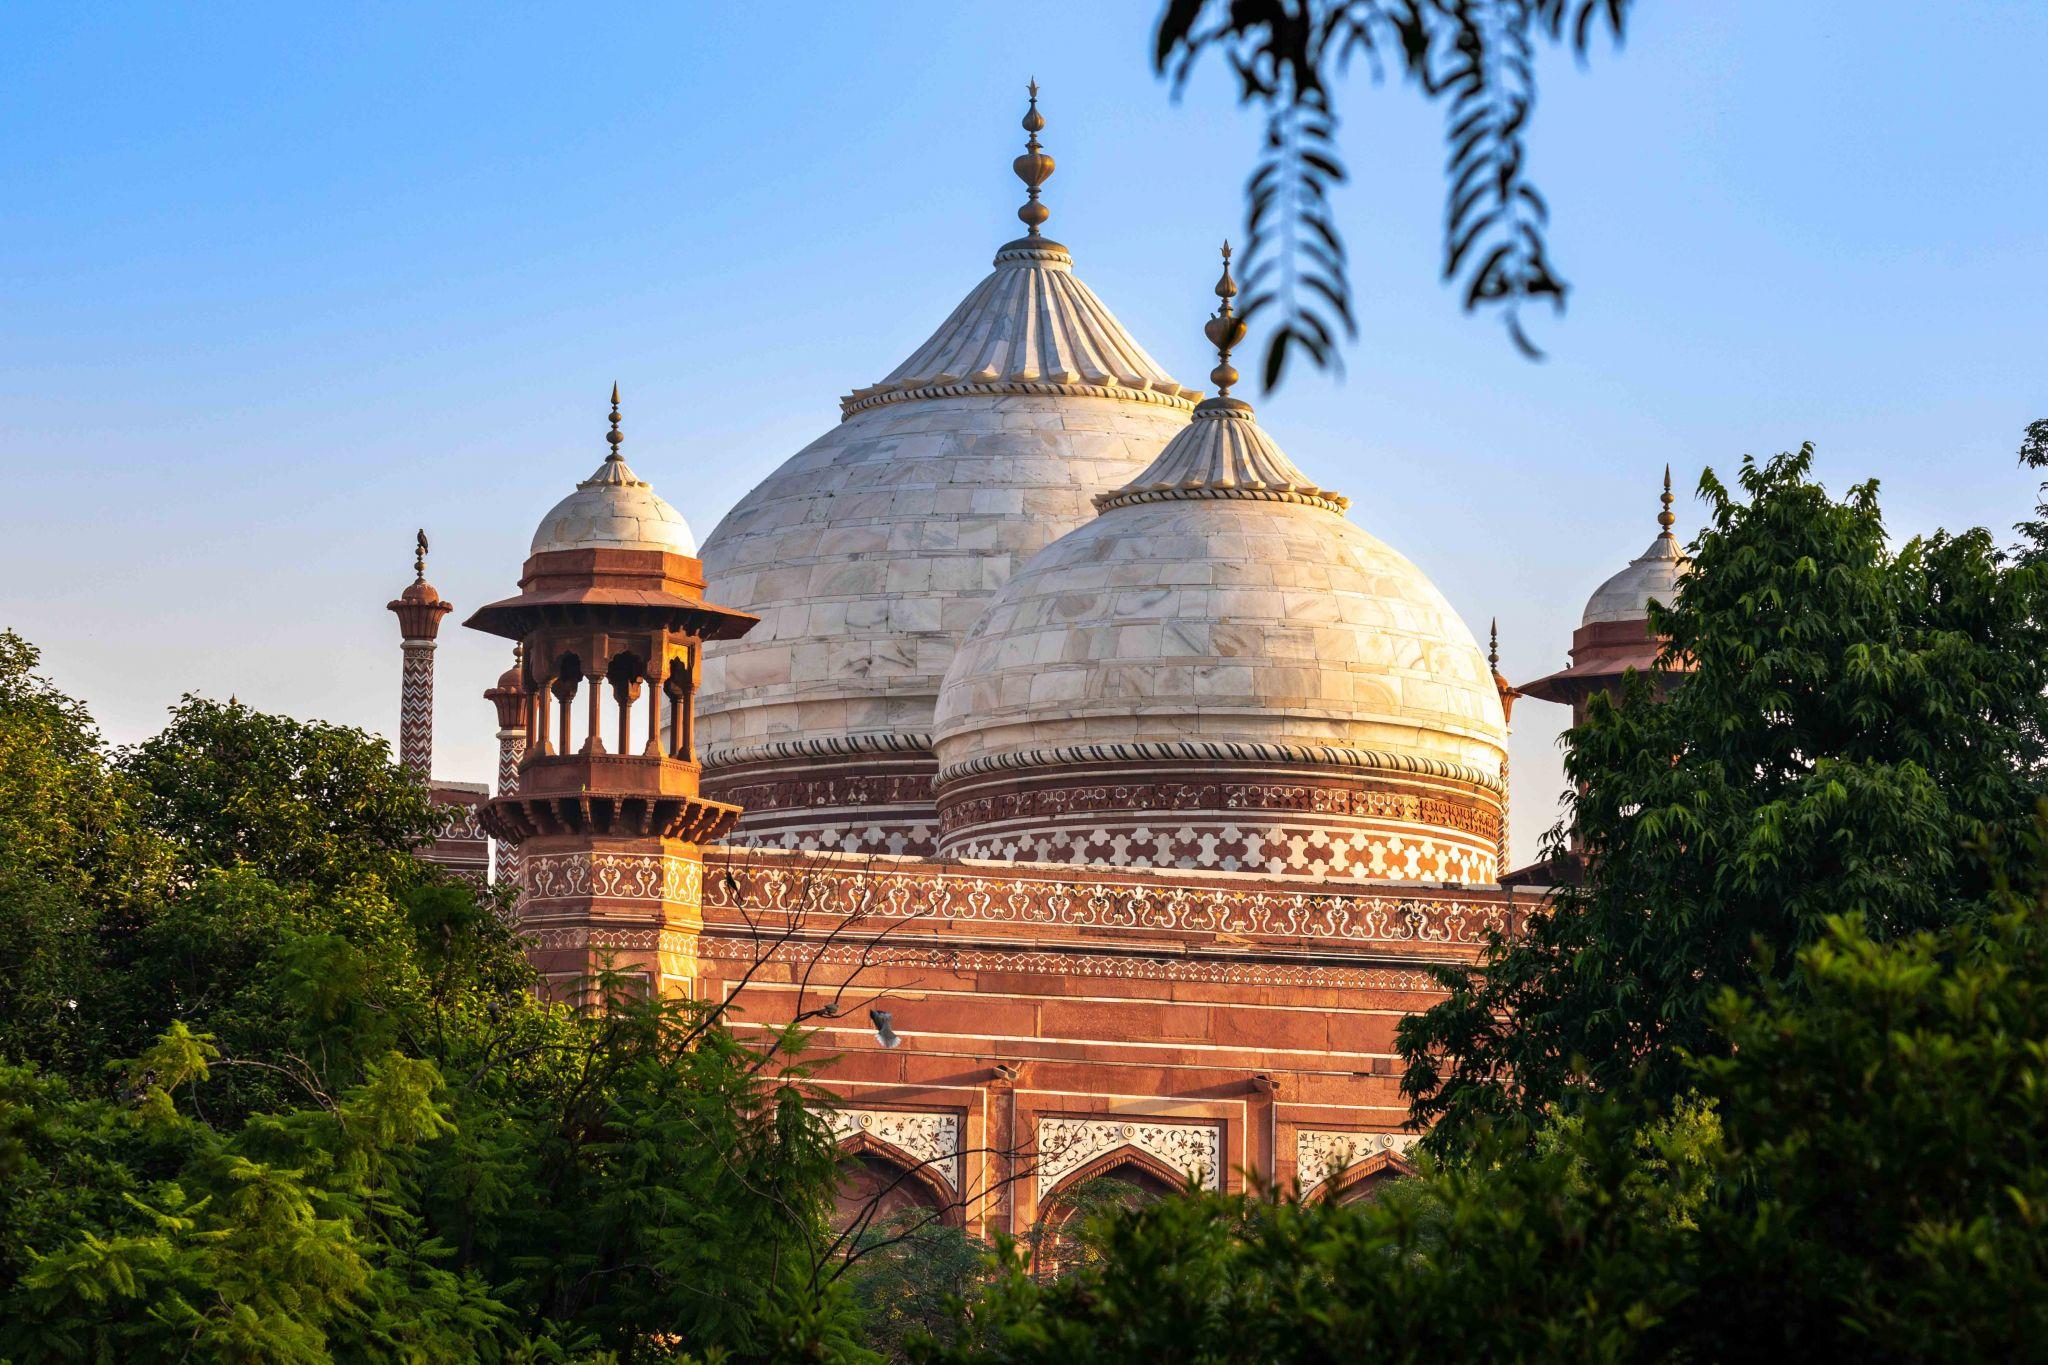 Mehmaan khana, Taj Mahal, Agra, India